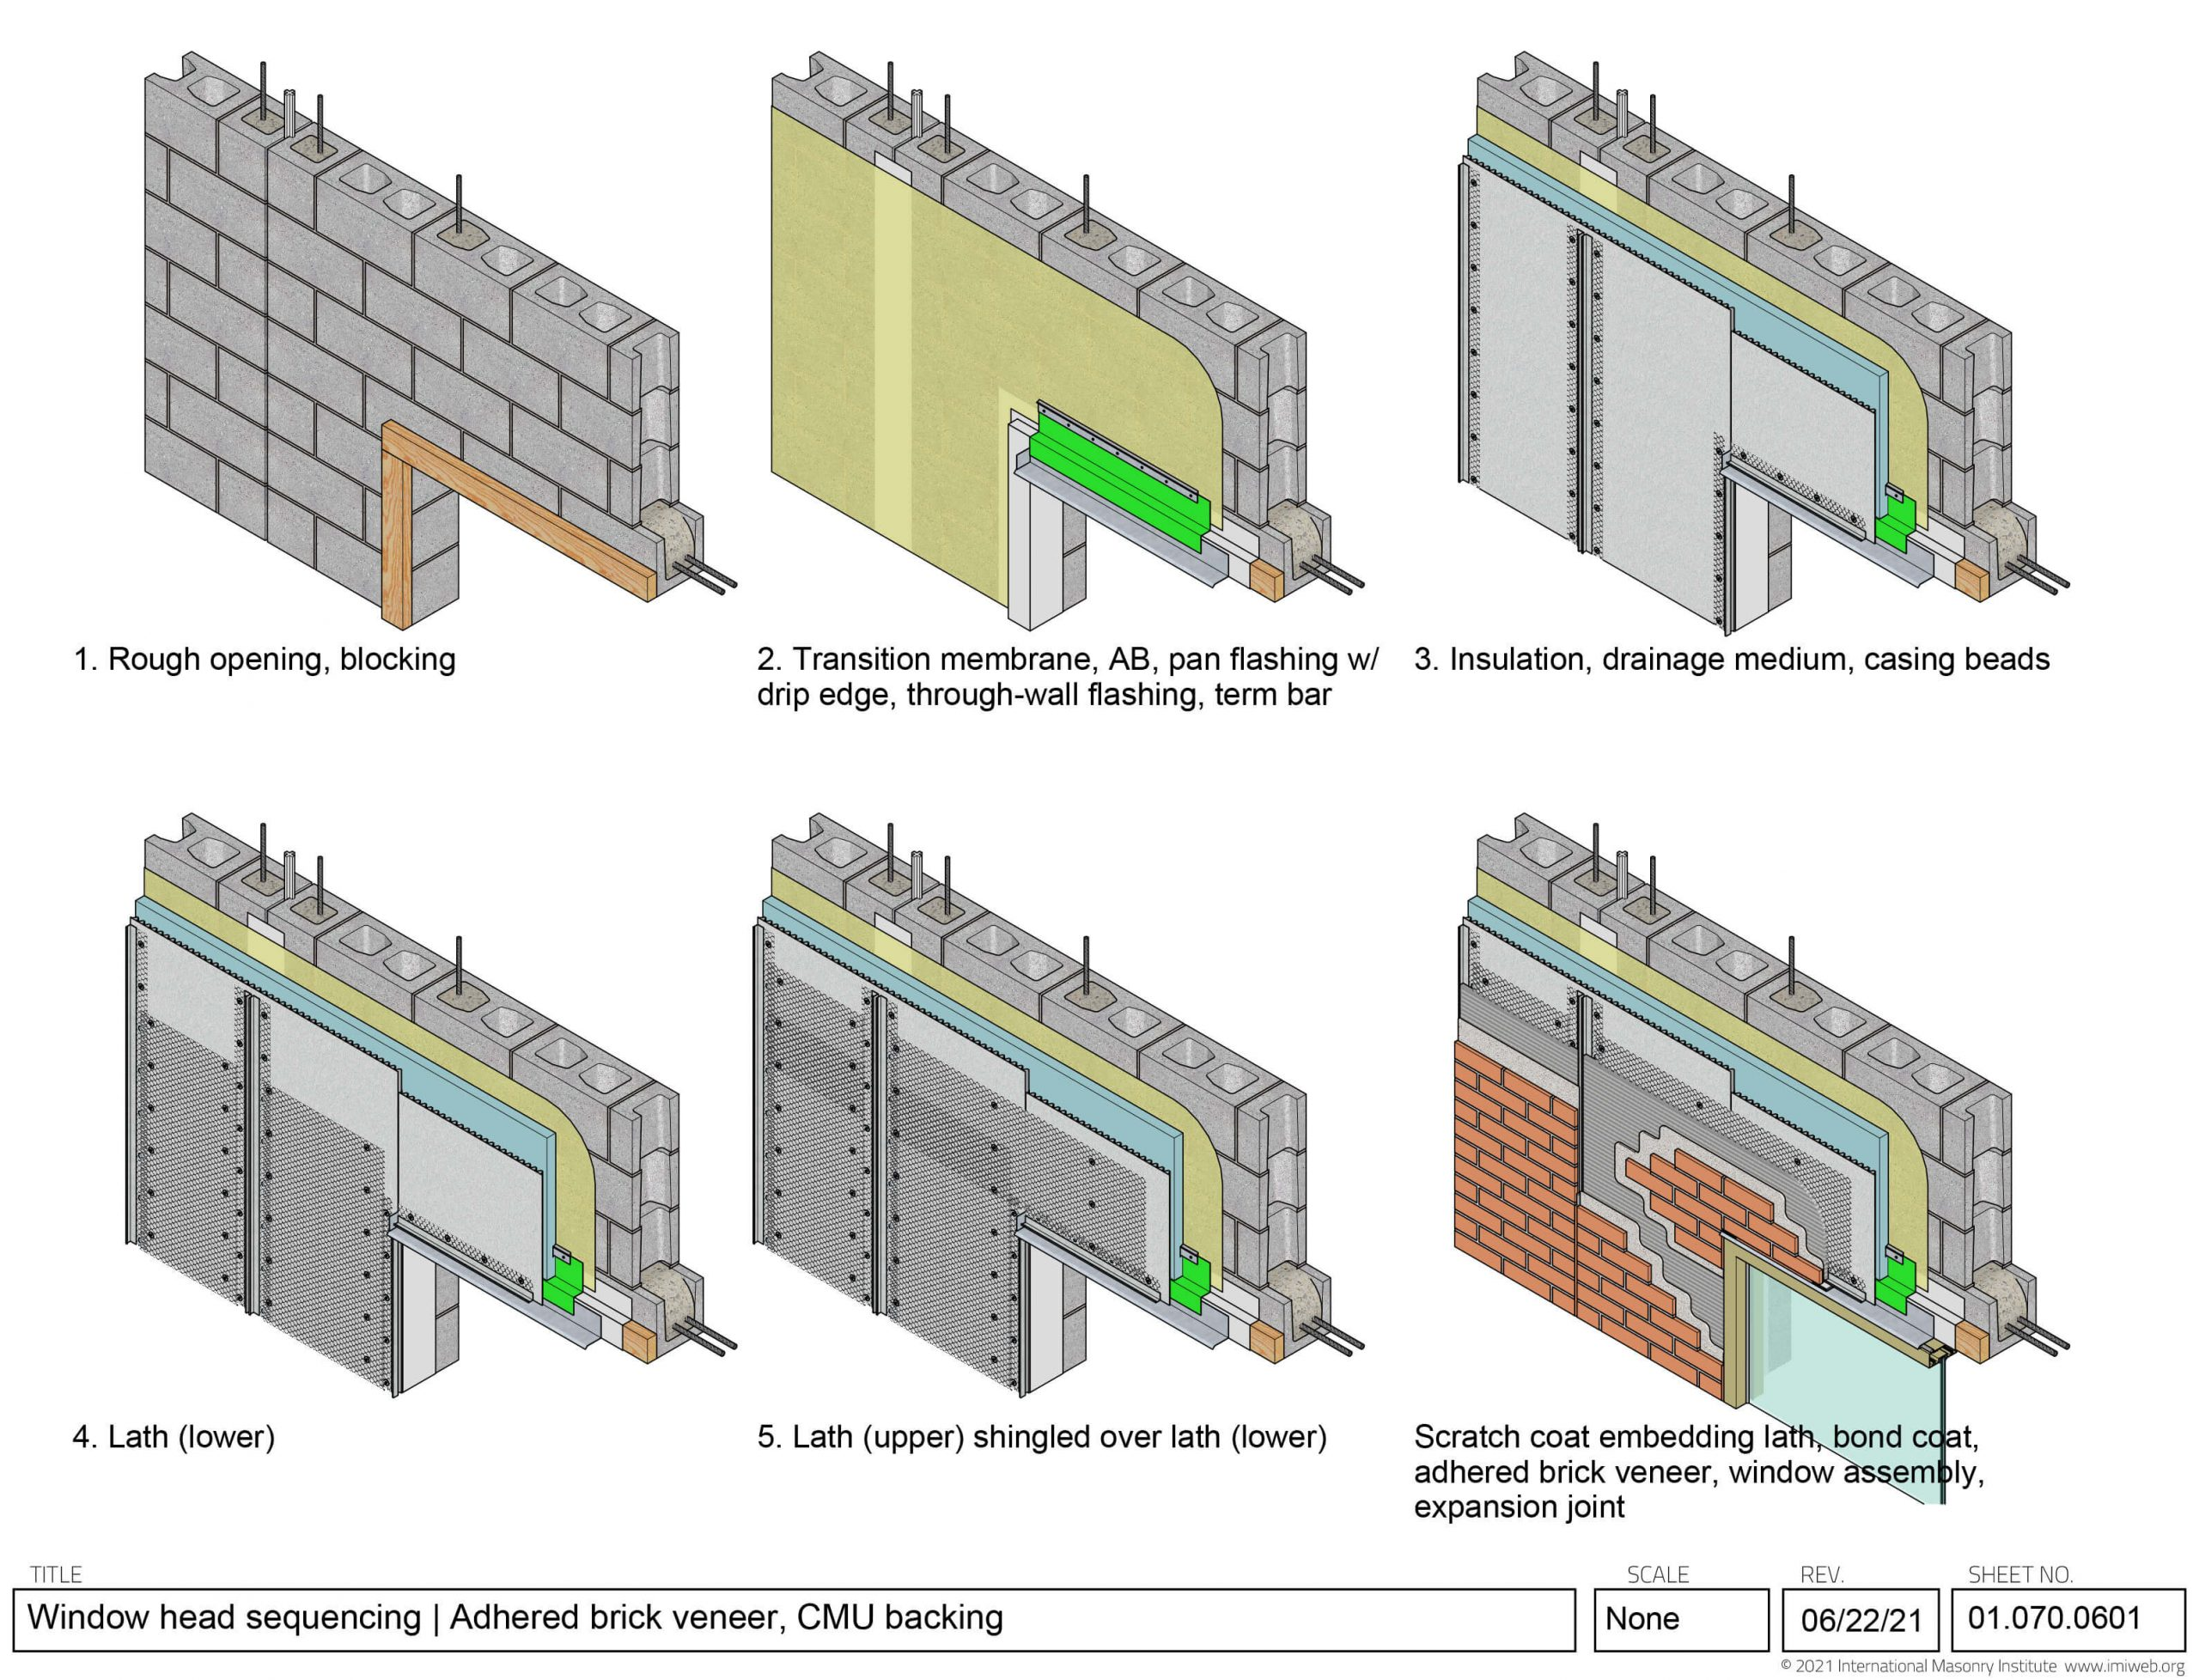 Installation sequence of an adhered brick veneer window head with CMU backing